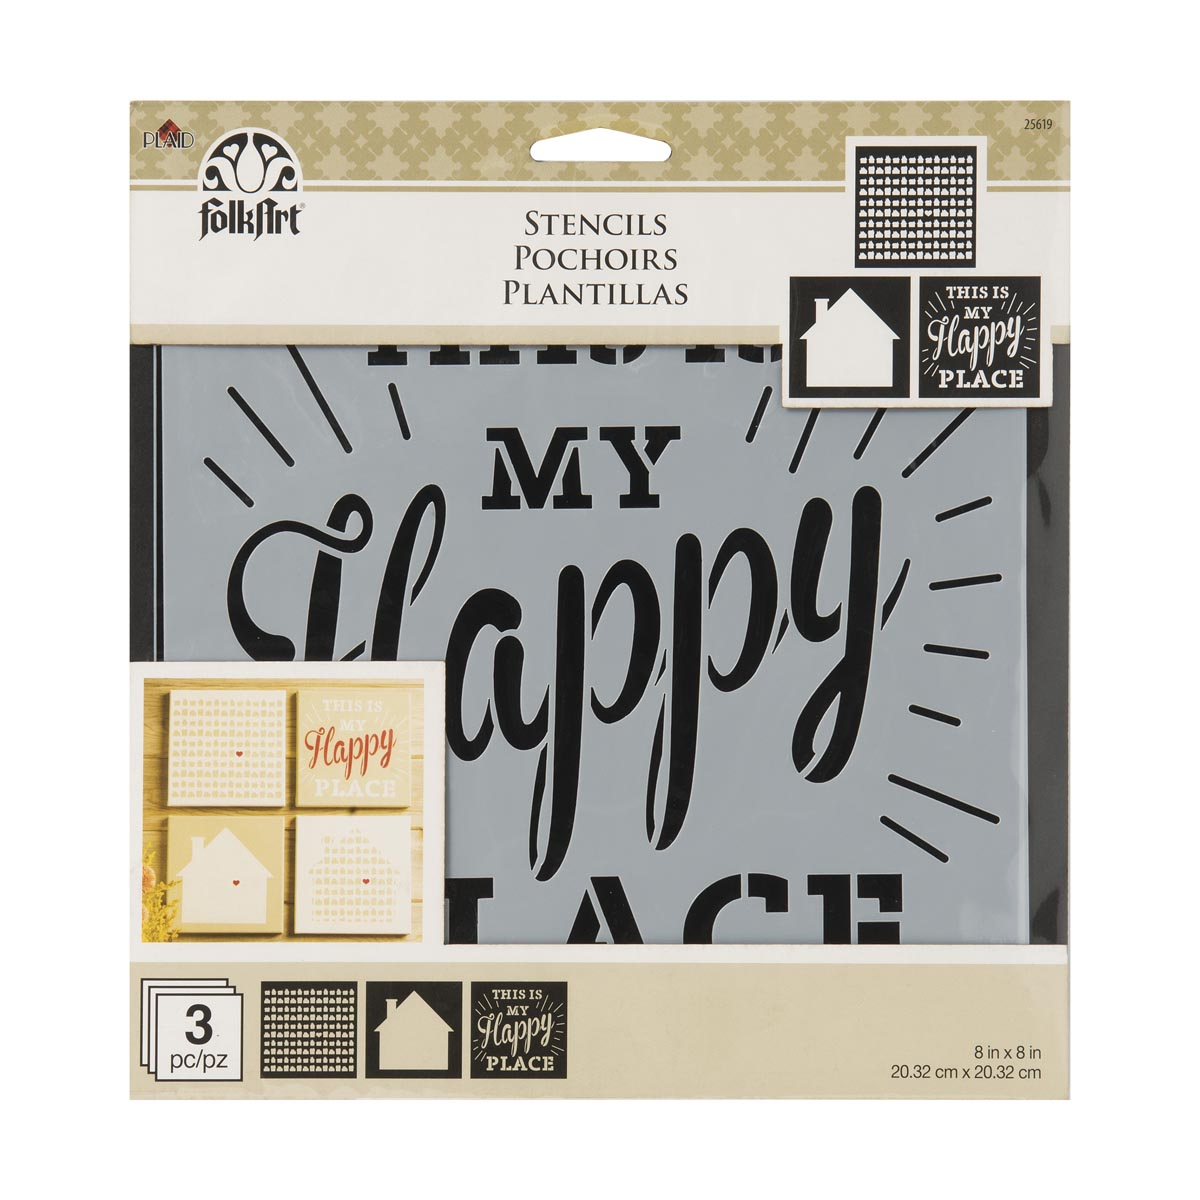 FolkArt ® Craft Stencils - Value Packs - Home Sweet Home